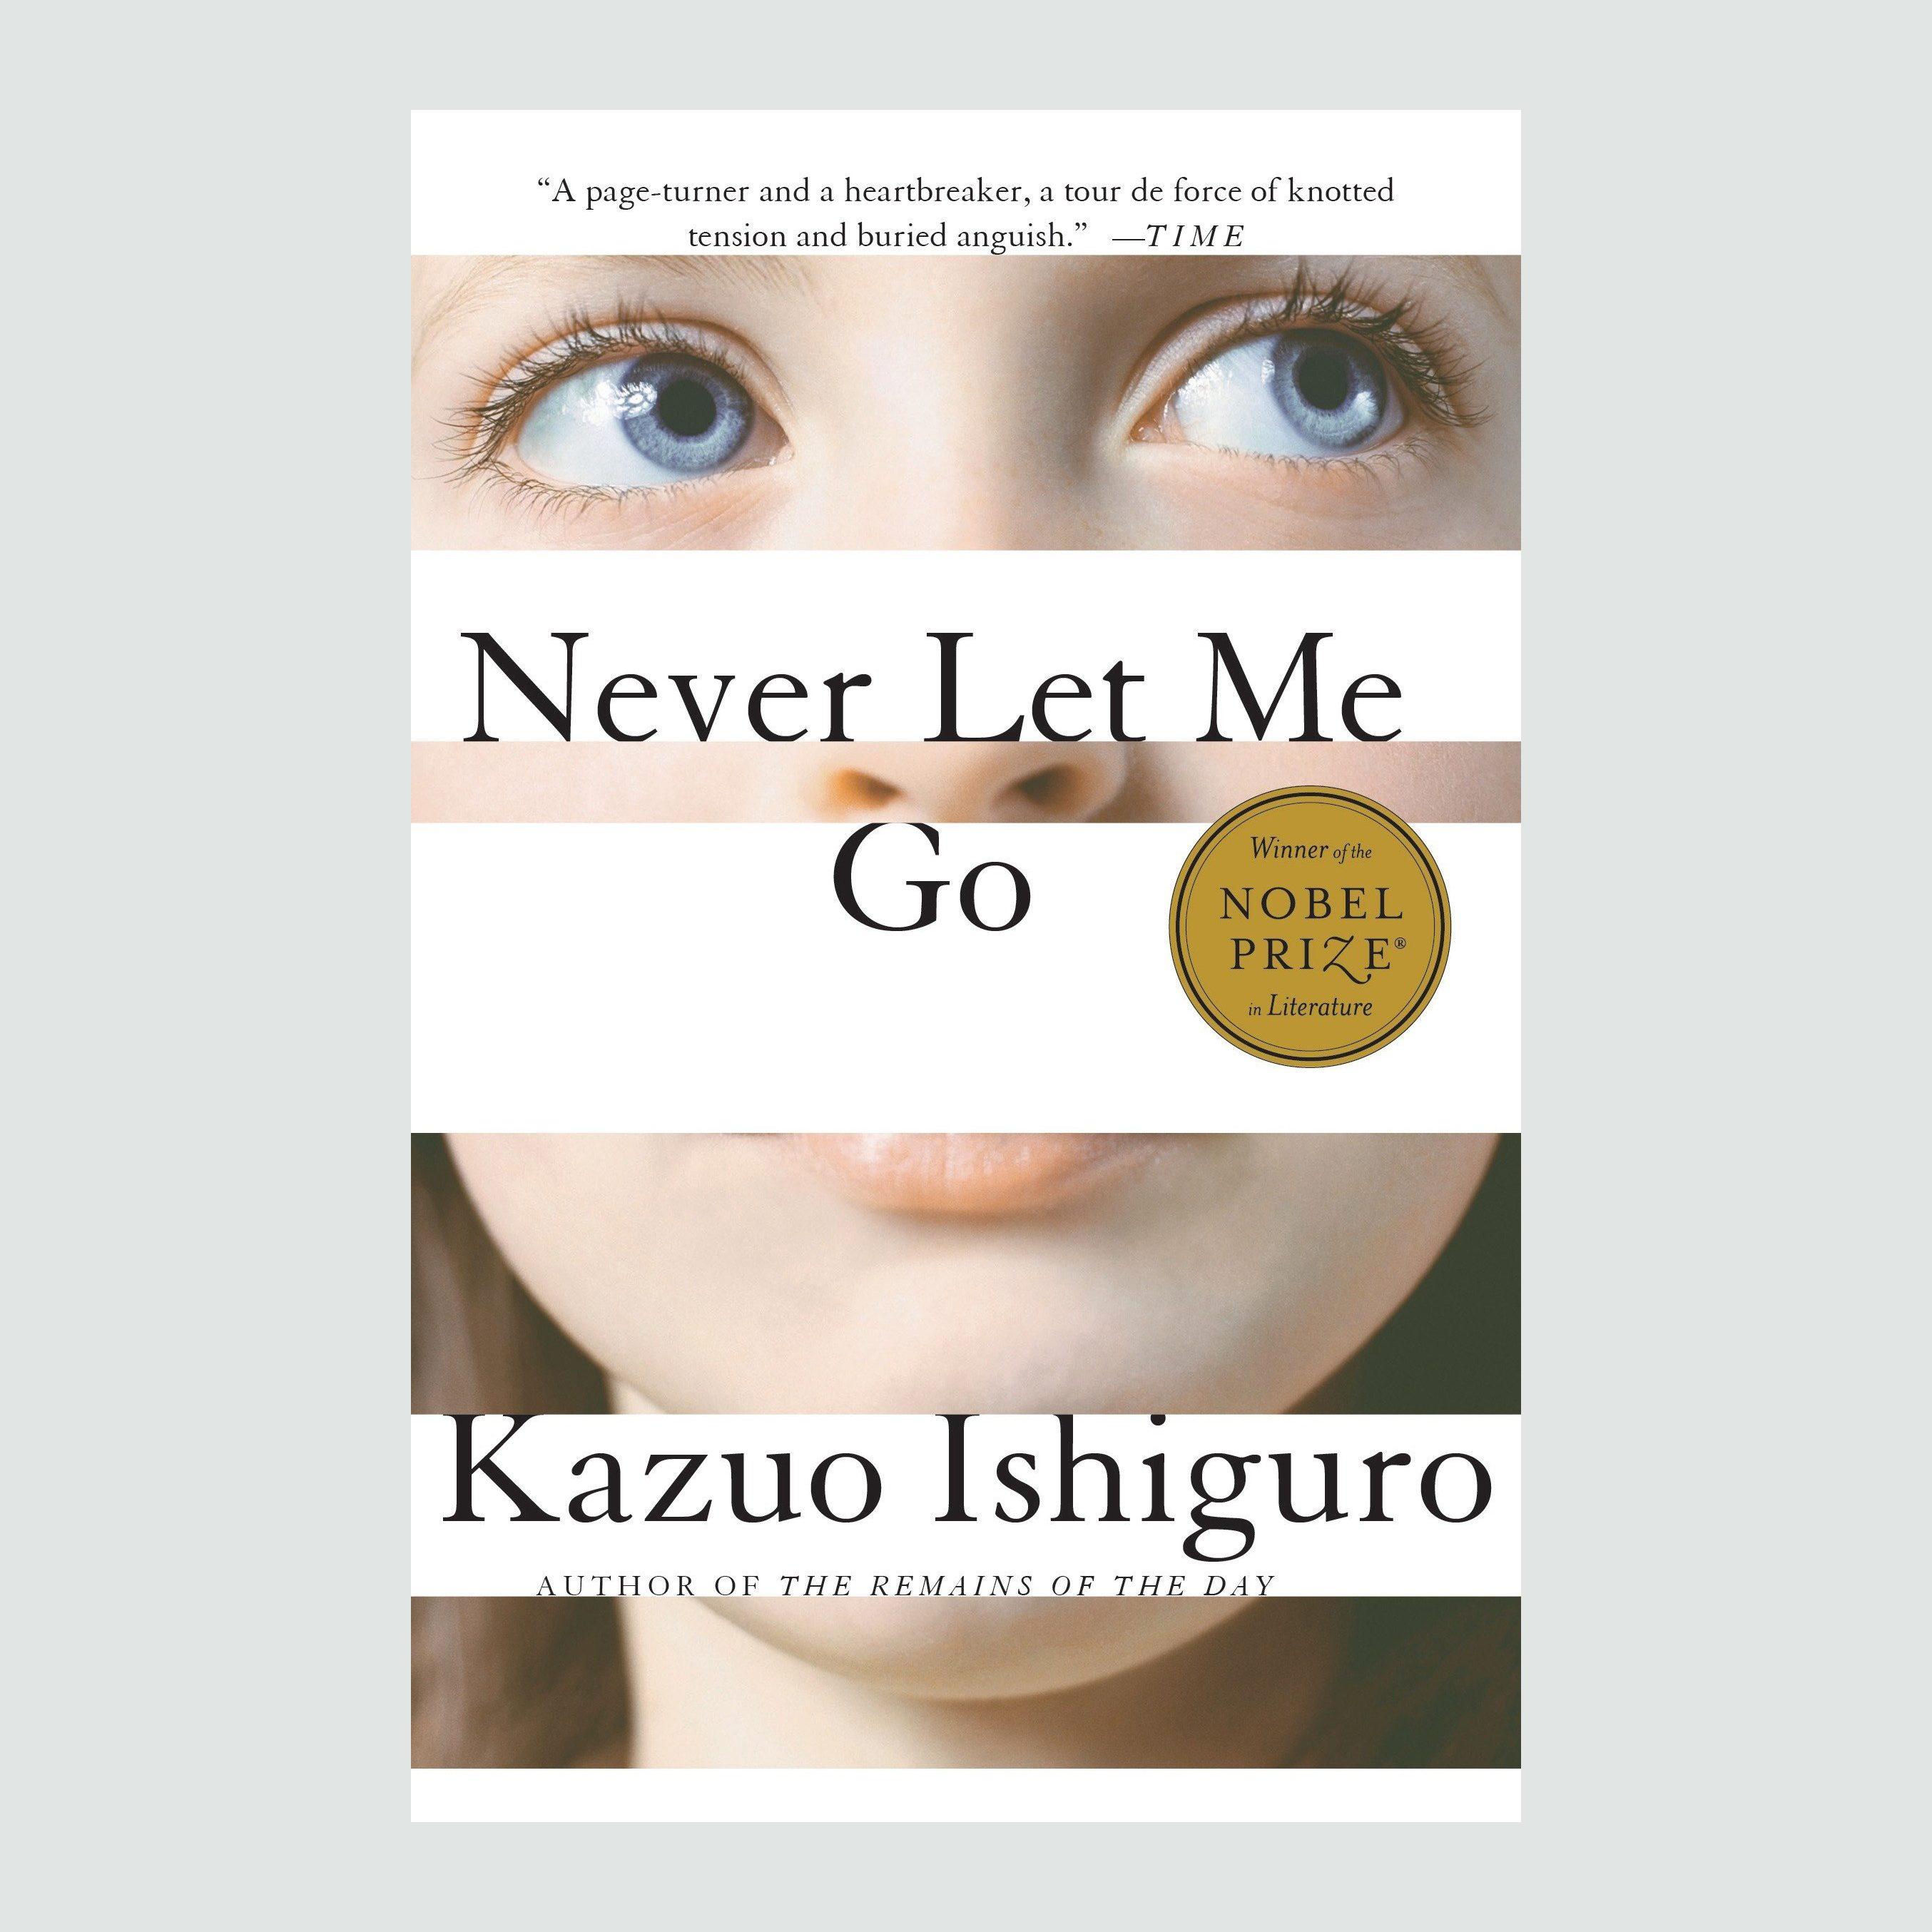 Kazuo Ishiguro nevet let me go author book